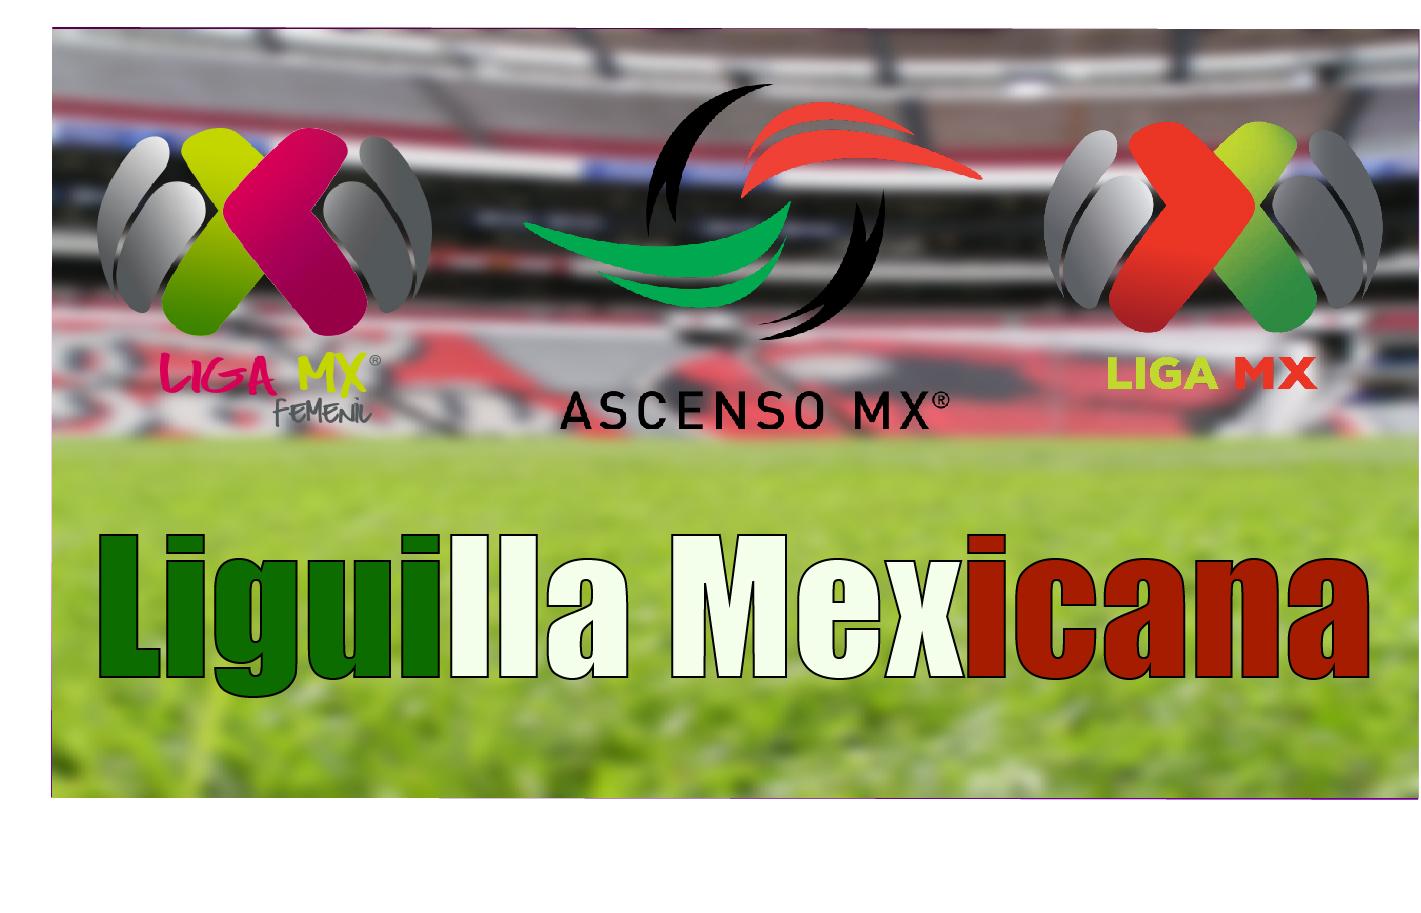 liguilla mexicana